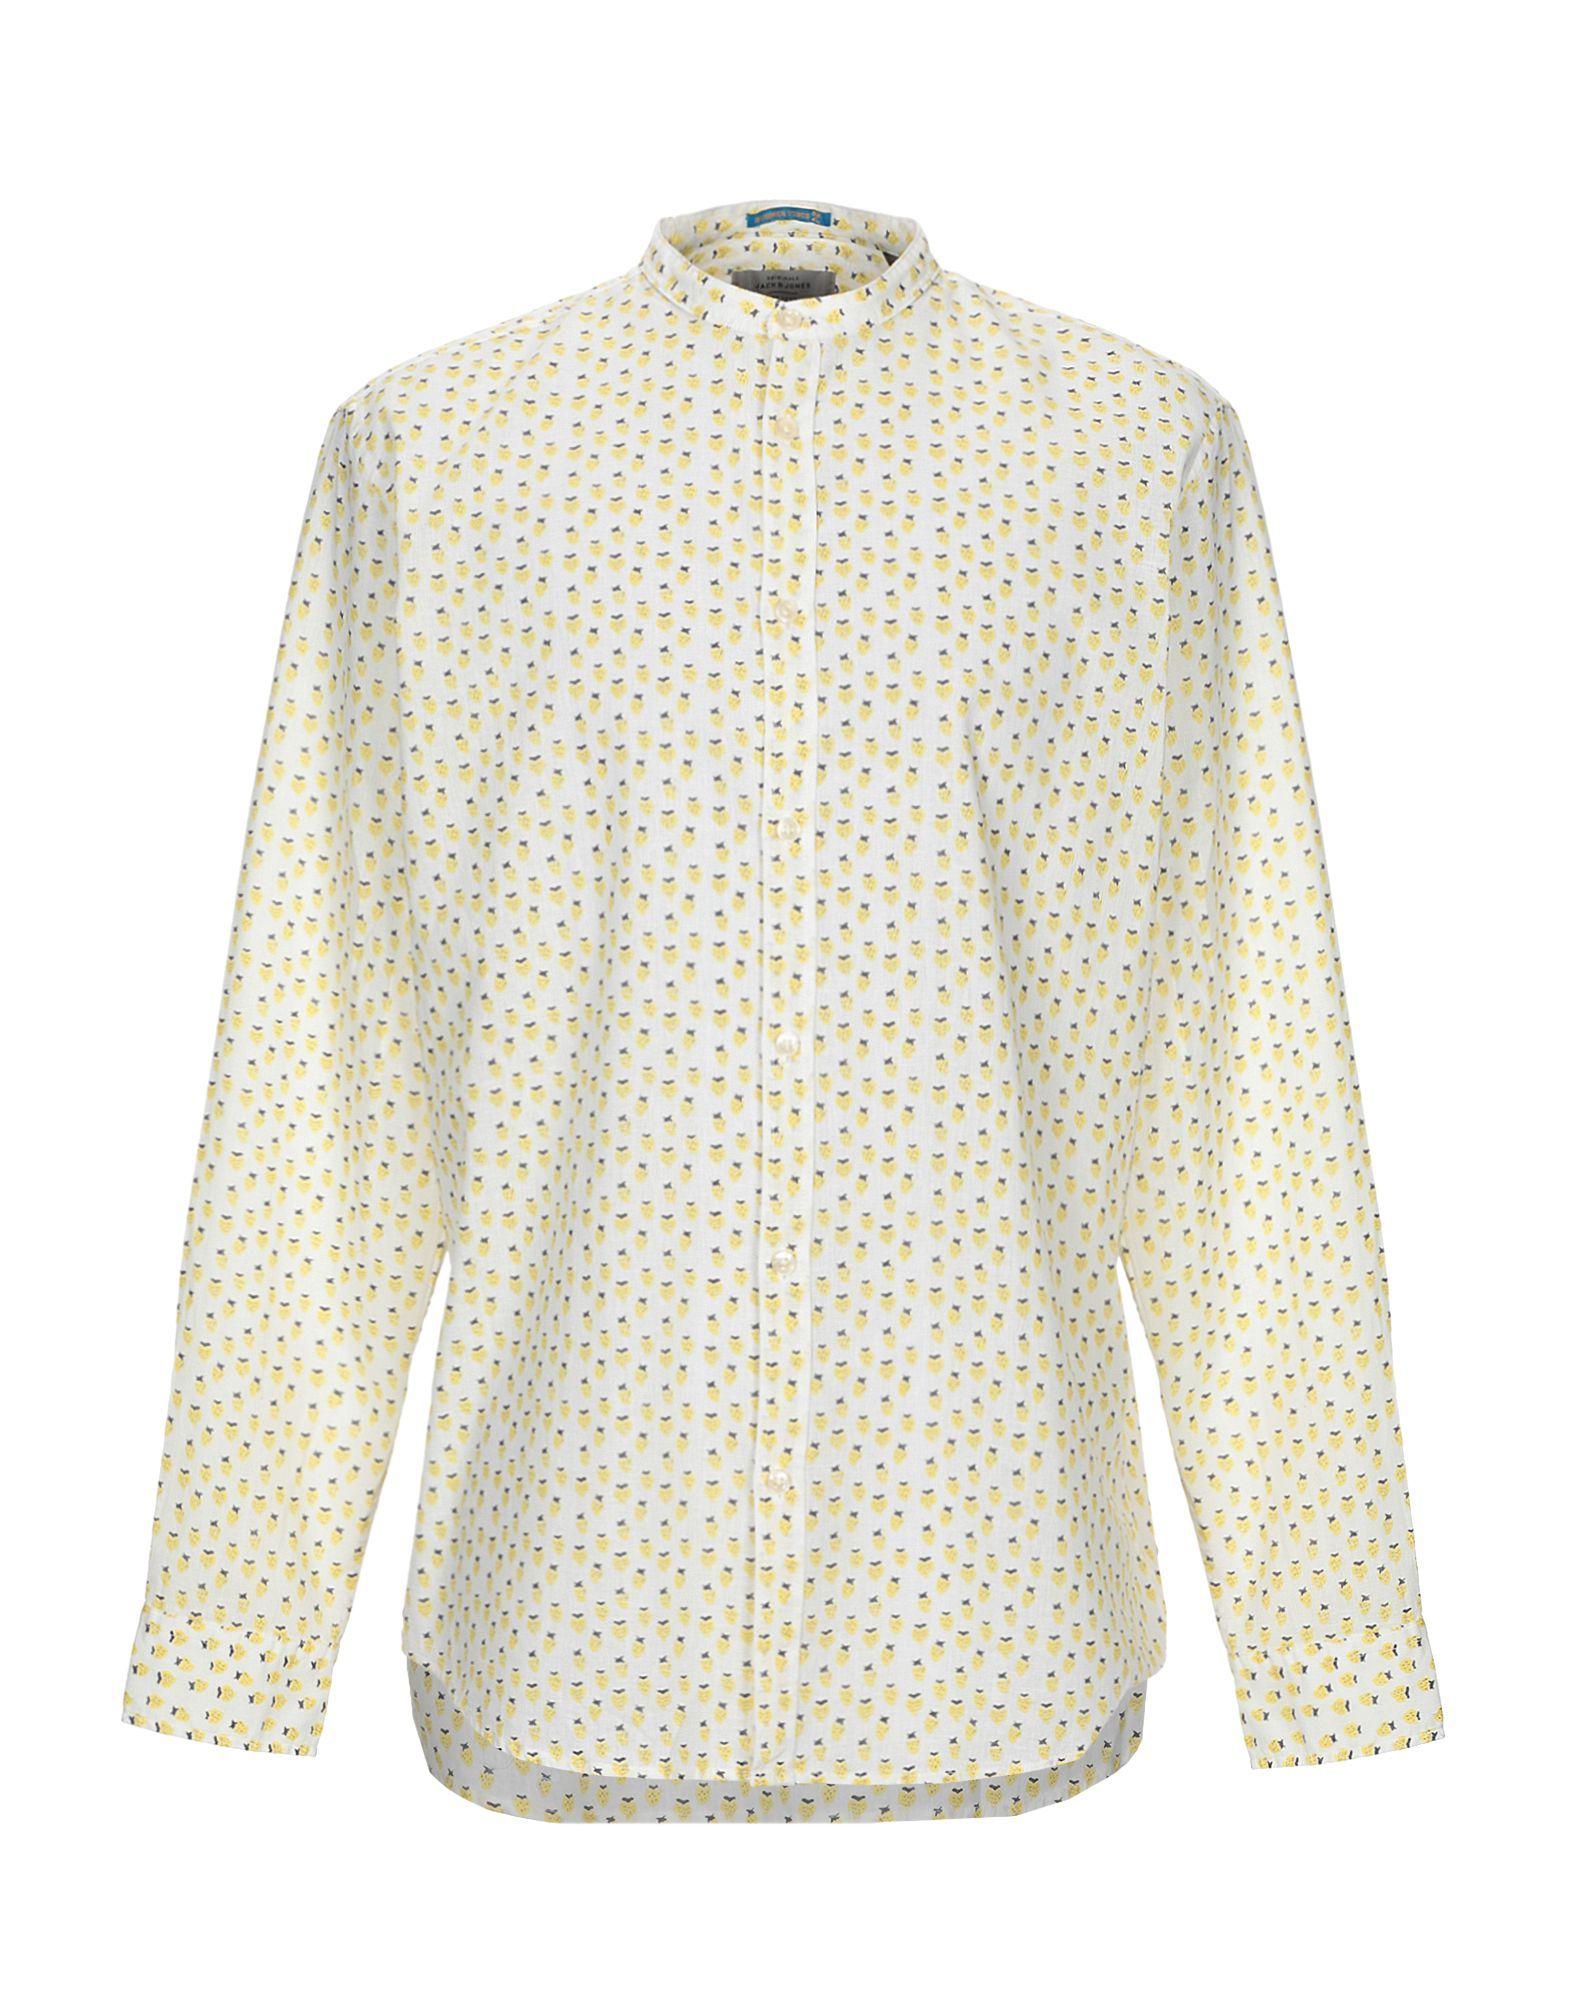 Jack & Jones Originals White Floral Design Linen Shirt